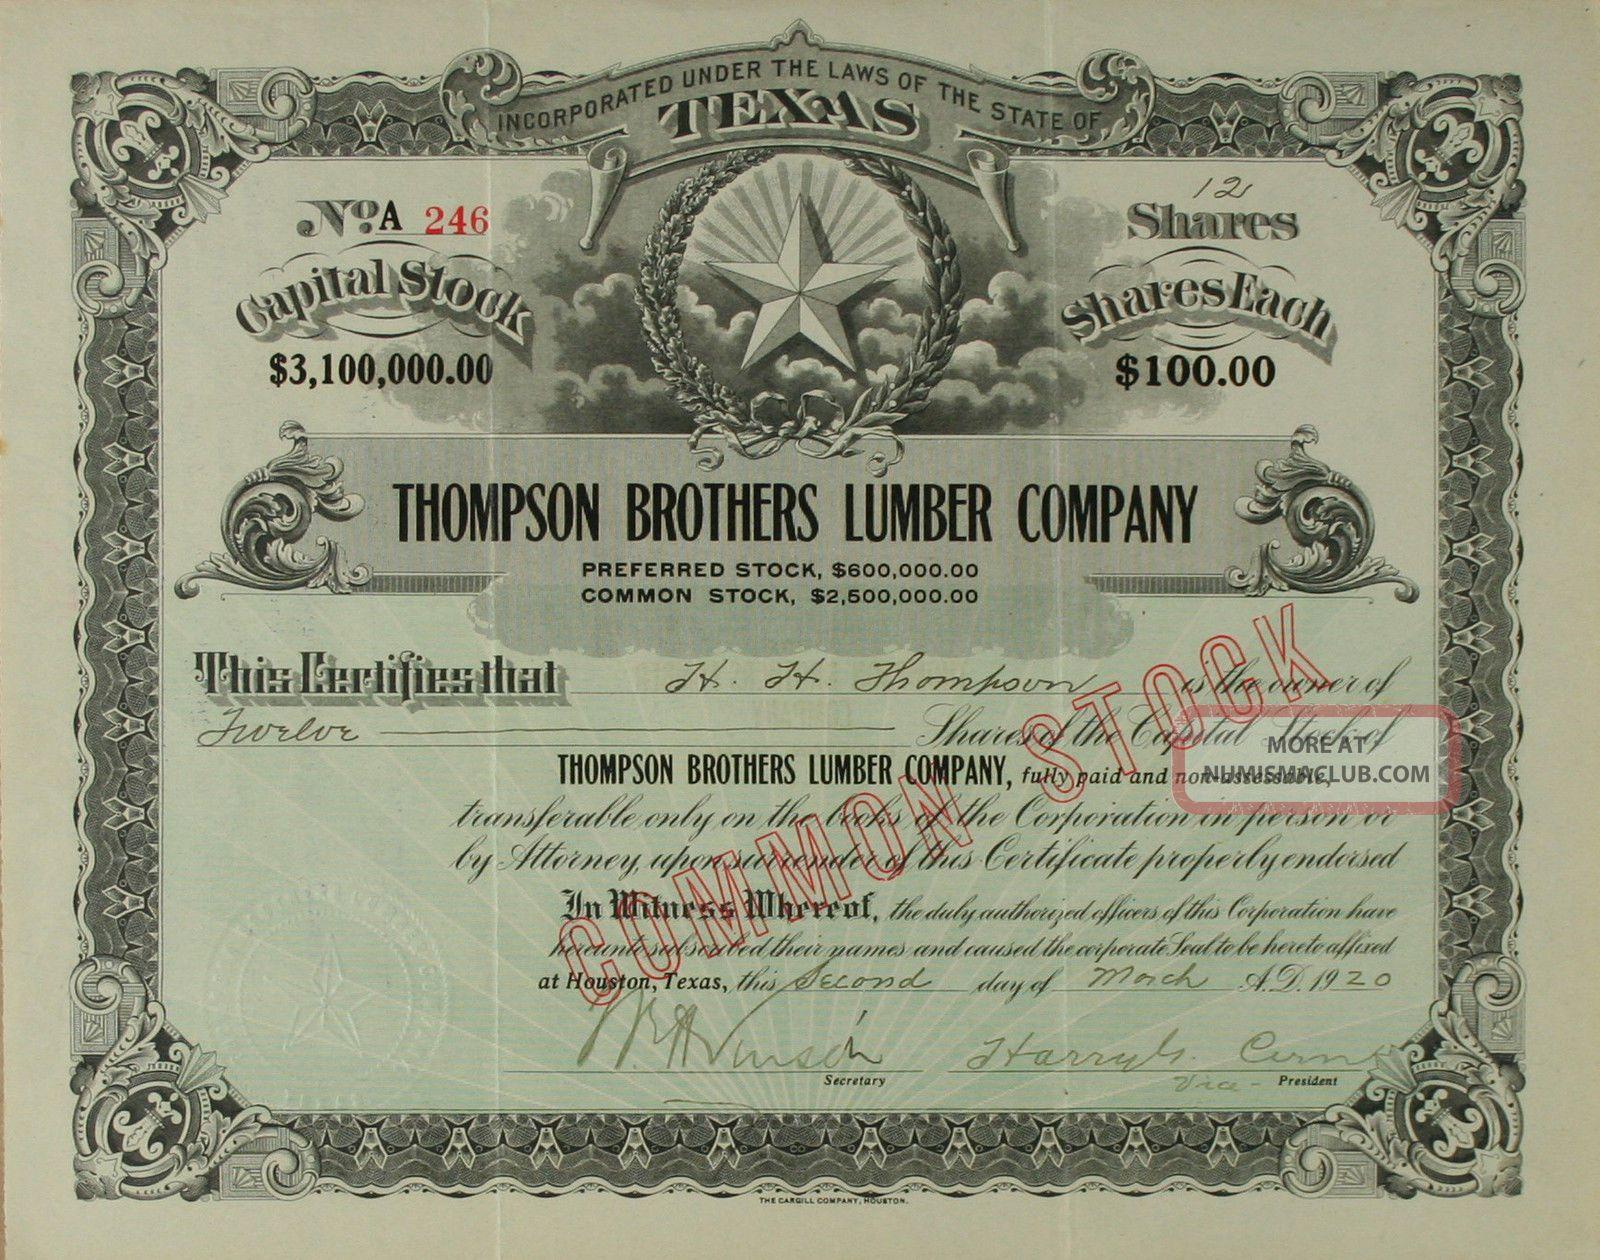 S968 Thompson Brothers Lumber Company Texas 1920s Stock Certificate Black Stocks & Bonds, Scripophily photo